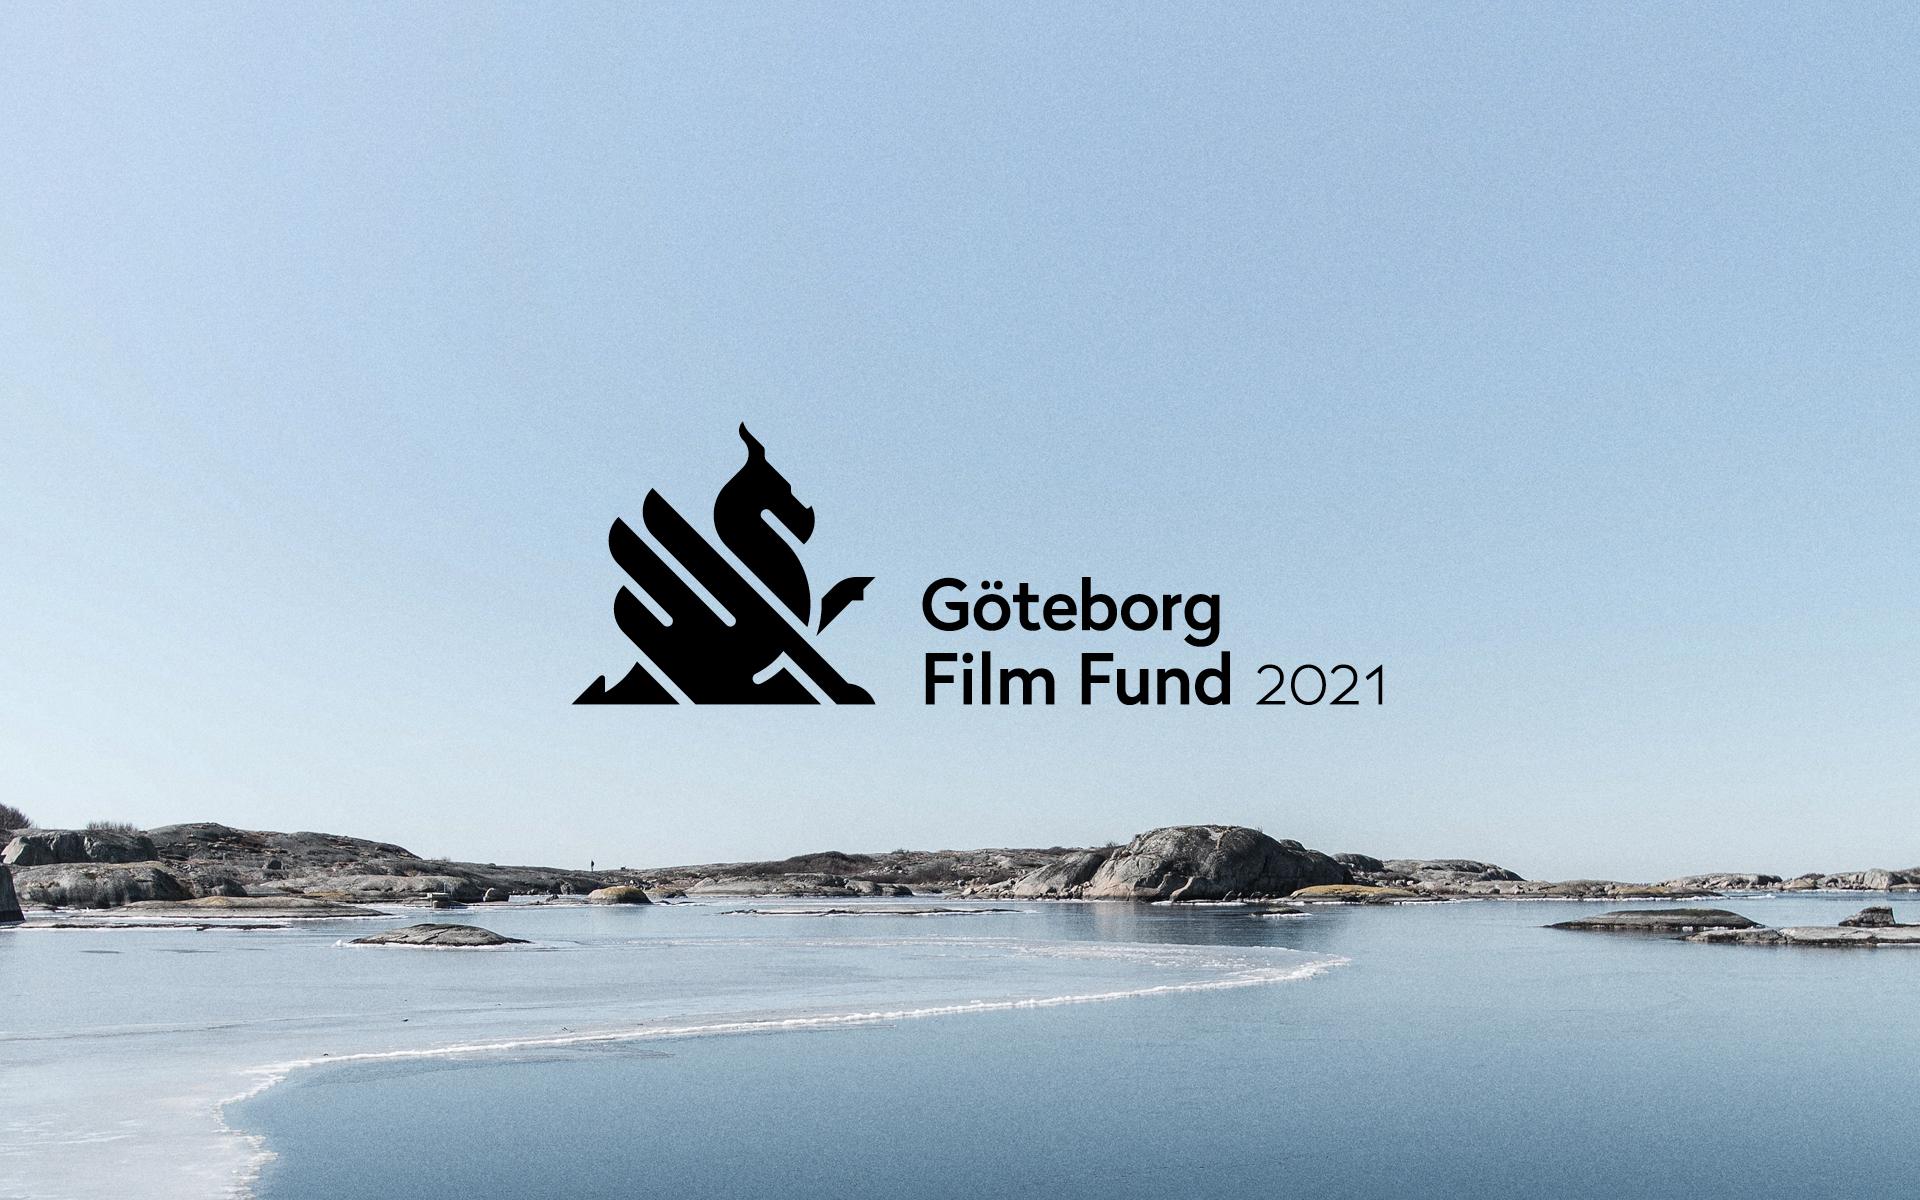 Göteborg Film Fund 2021 - Göteborg Film Festival